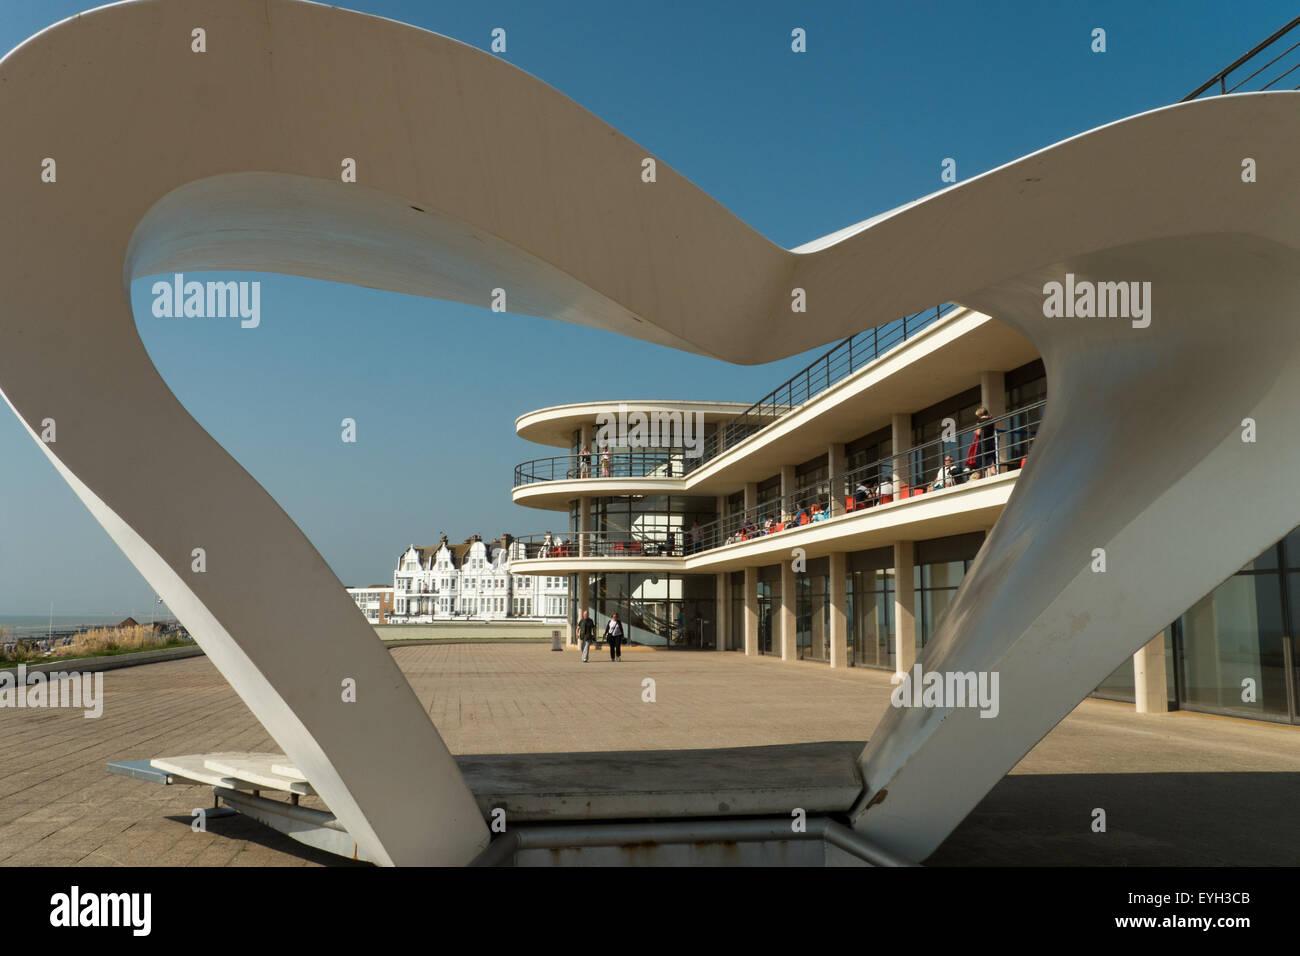 The Famous 1930's De La Warr Pavilion with Modernist Sculpture, Bexhill-on-Sea, East Sussex, England - Stock Image